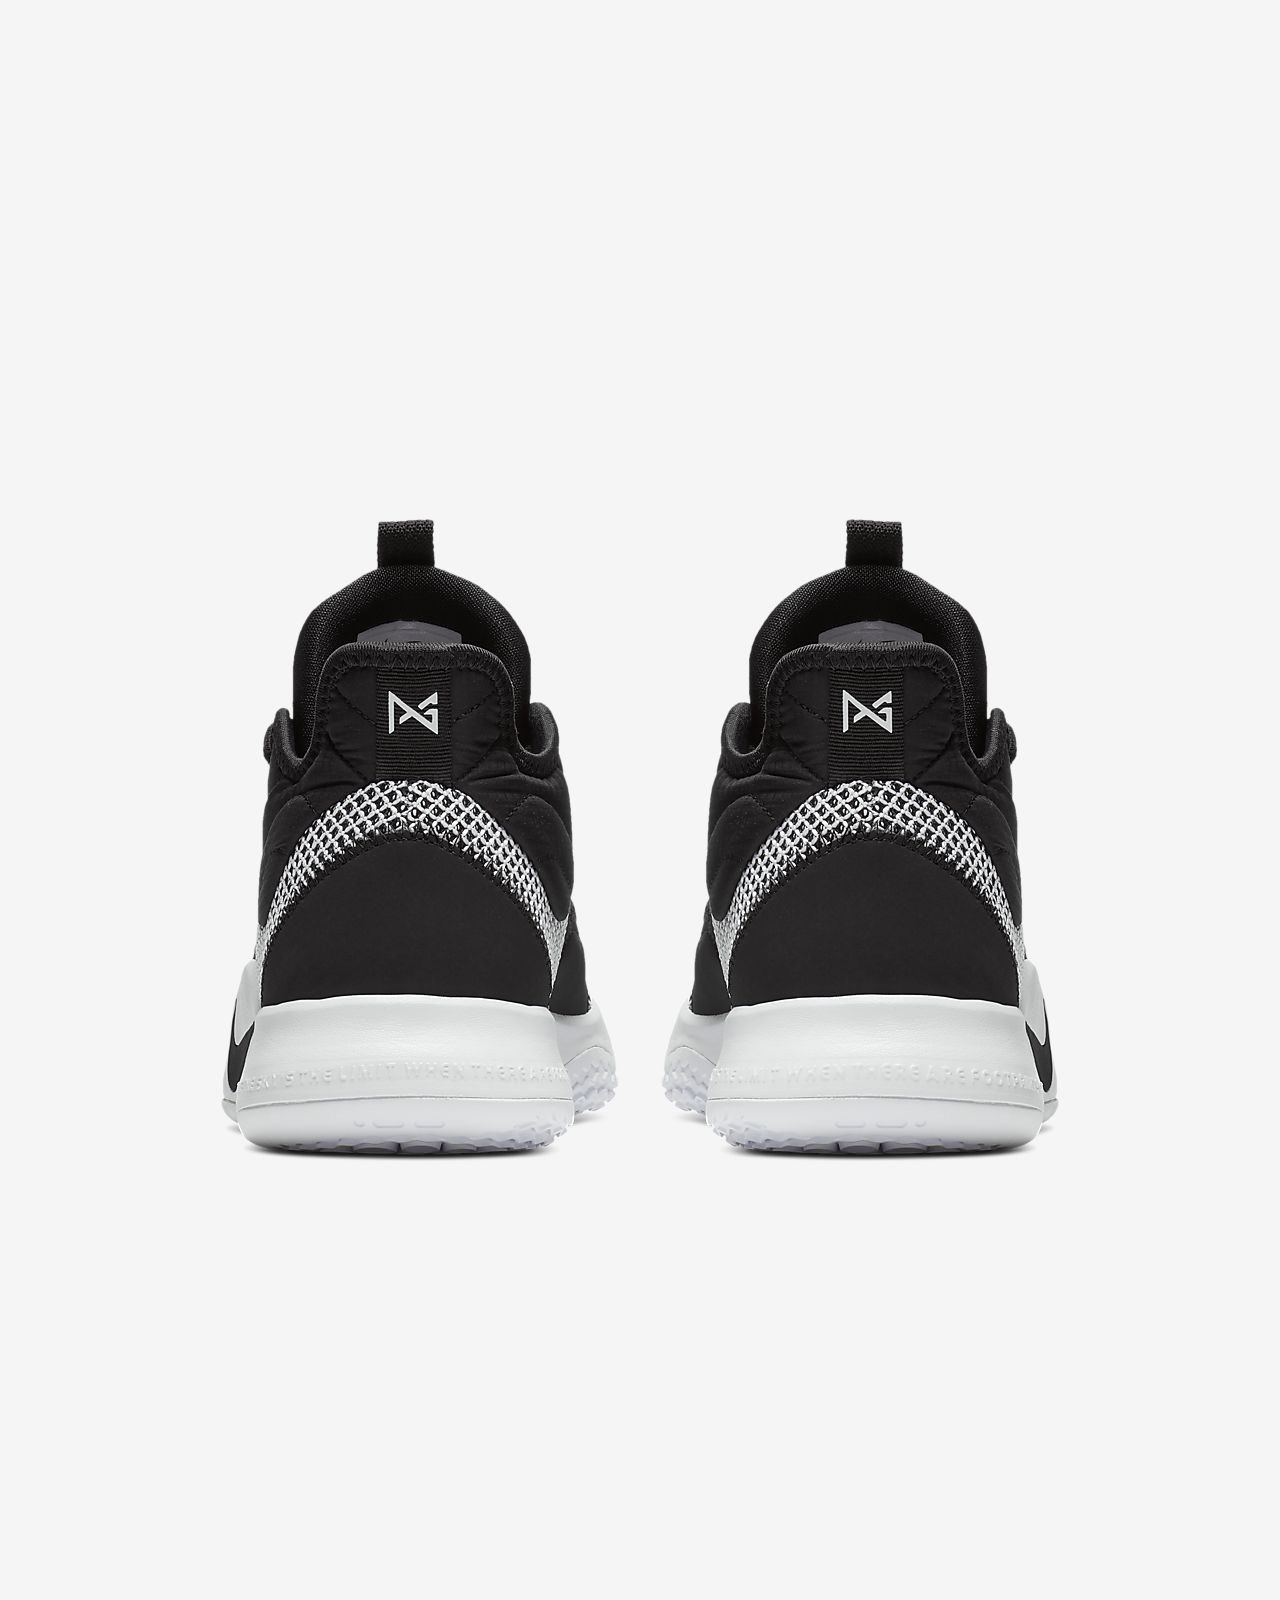 1fa39b39c3c Low Resolution PG 3 Basketball Shoe PG 3 Basketball Shoe